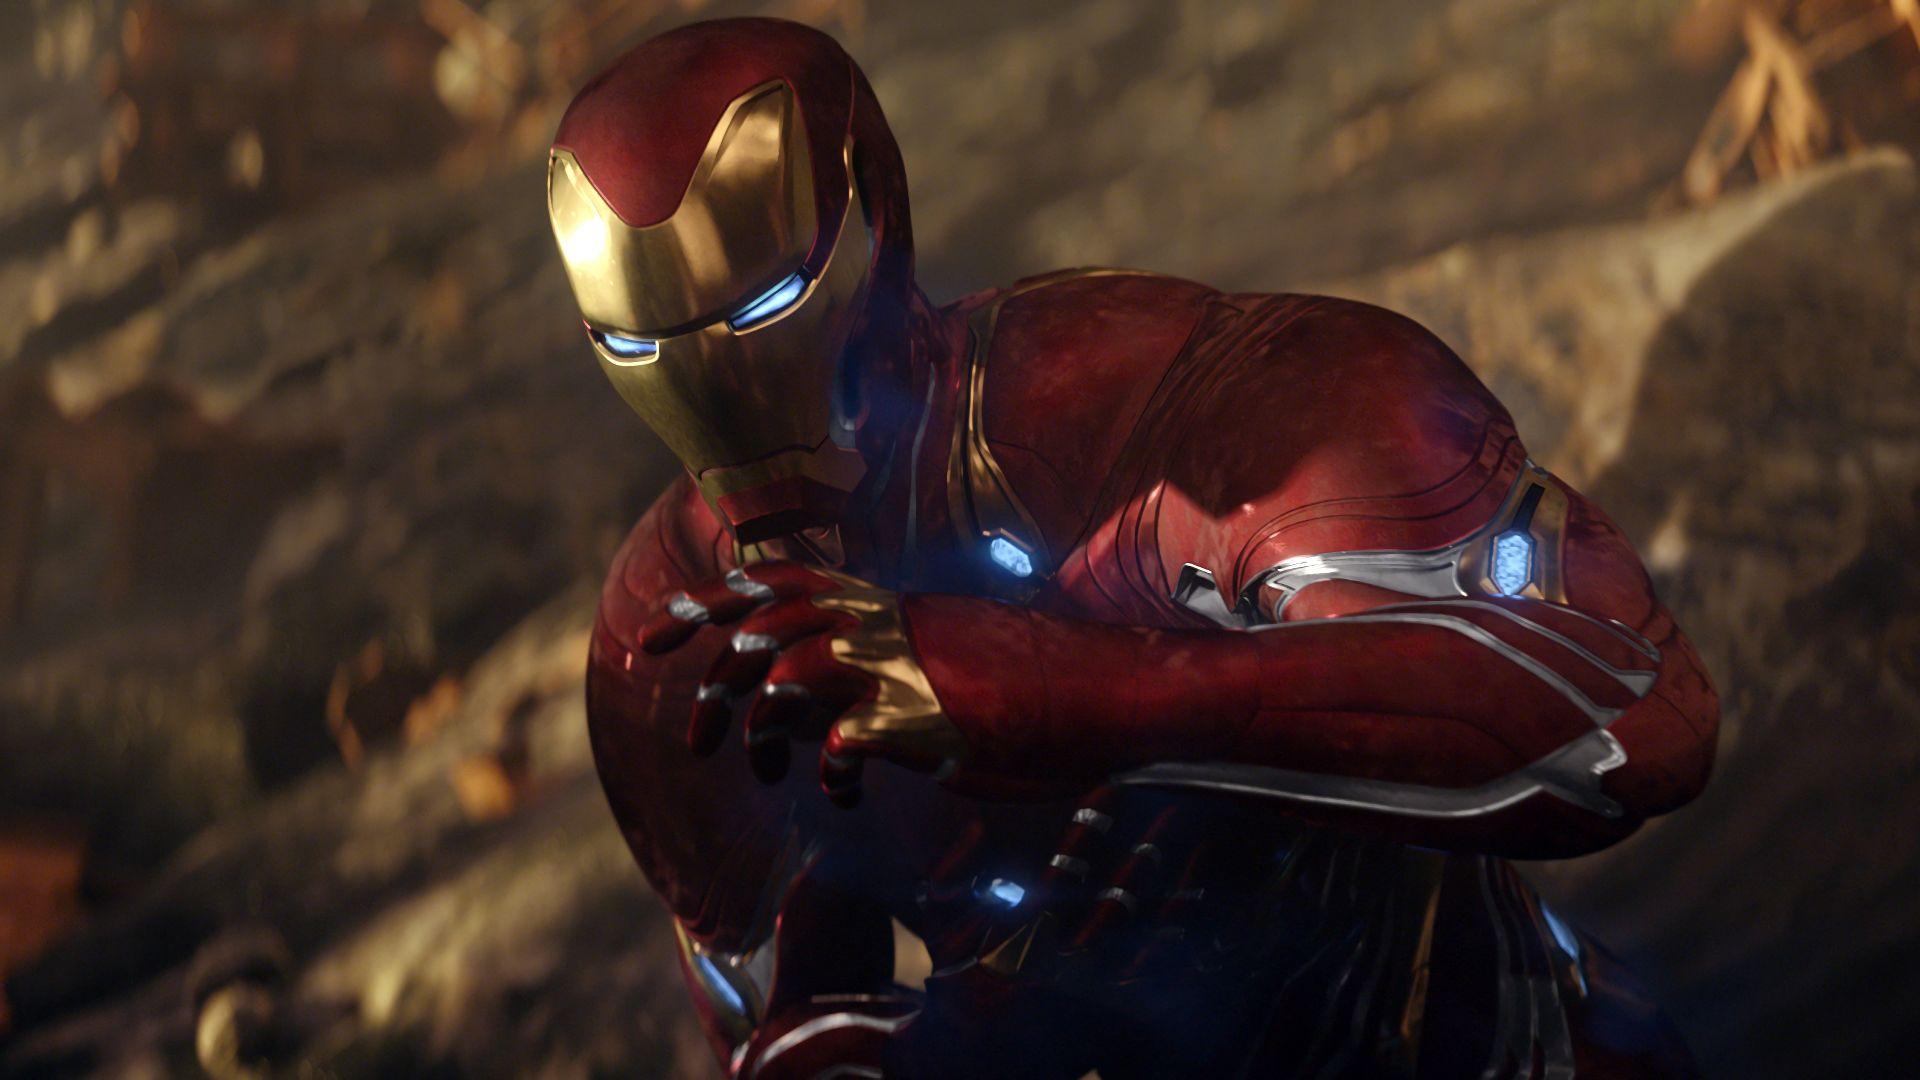 Wallpaper Avengers Infinity War Iron Man 4k Movies 17800